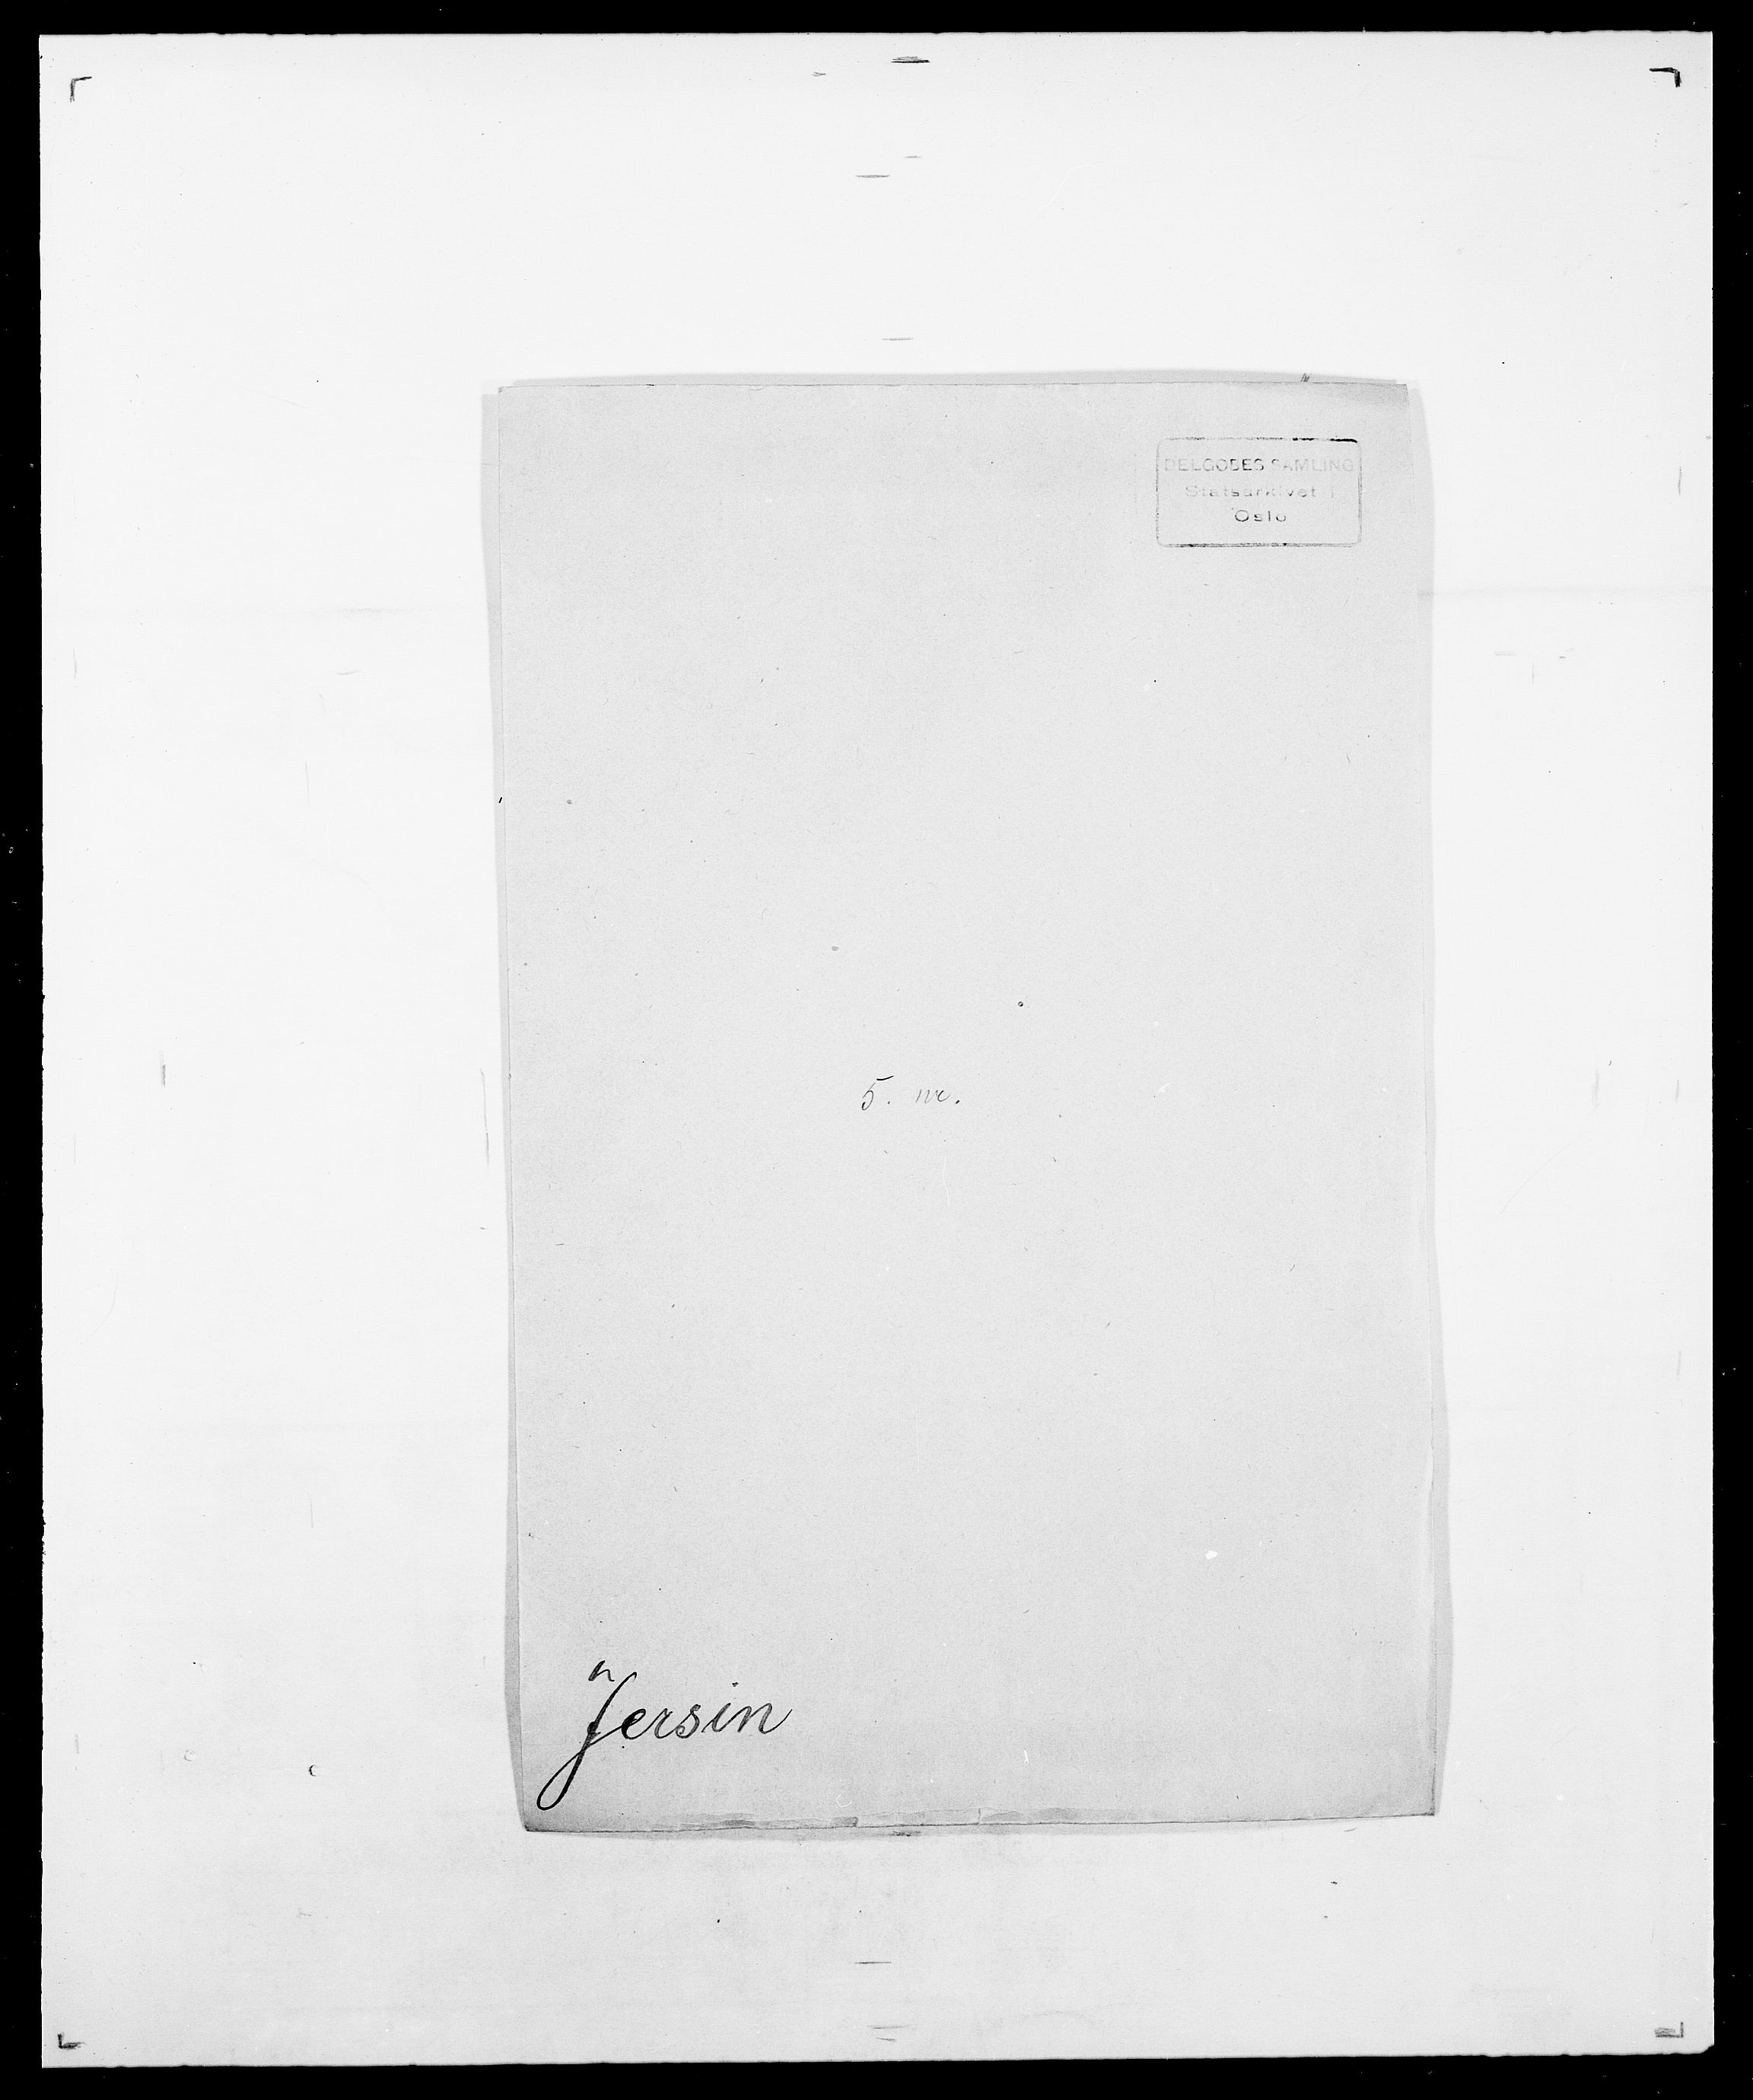 SAO, Delgobe, Charles Antoine - samling, D/Da/L0019: van der Hude - Joys, s. 706